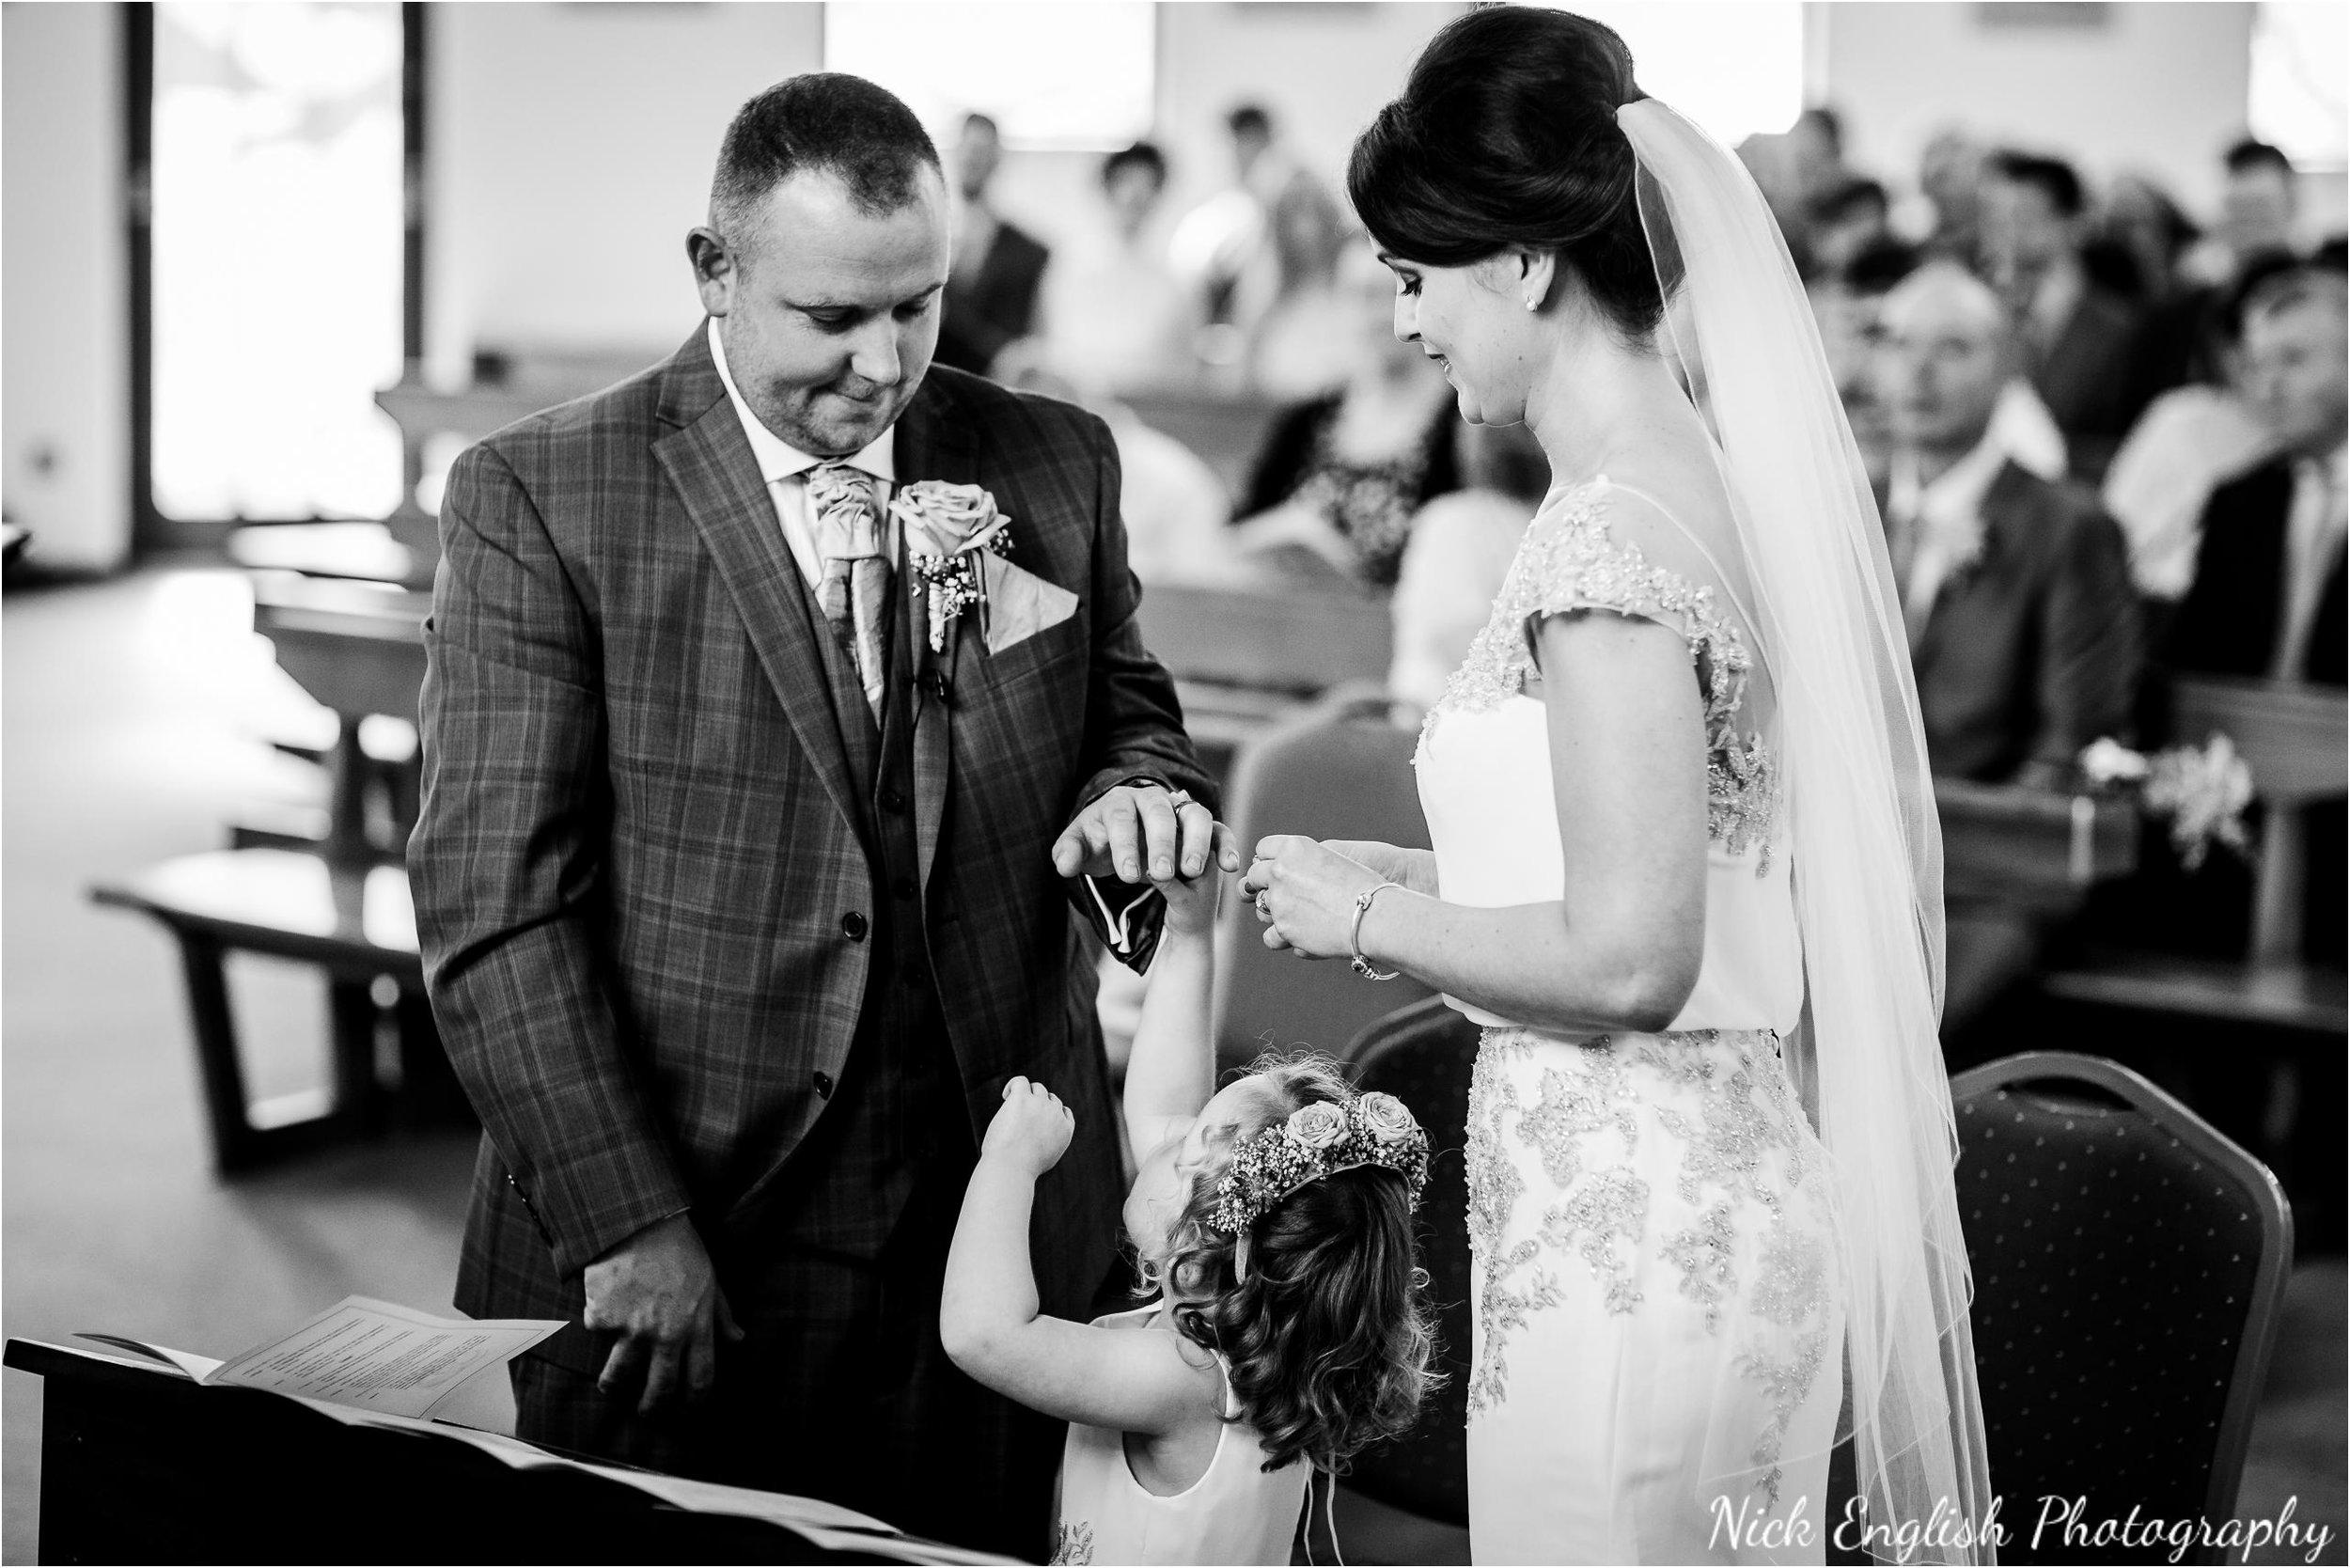 Stacey-Ash-Wedding-Photographs-Stanley-House-Preston-Lancashire-67.jpg